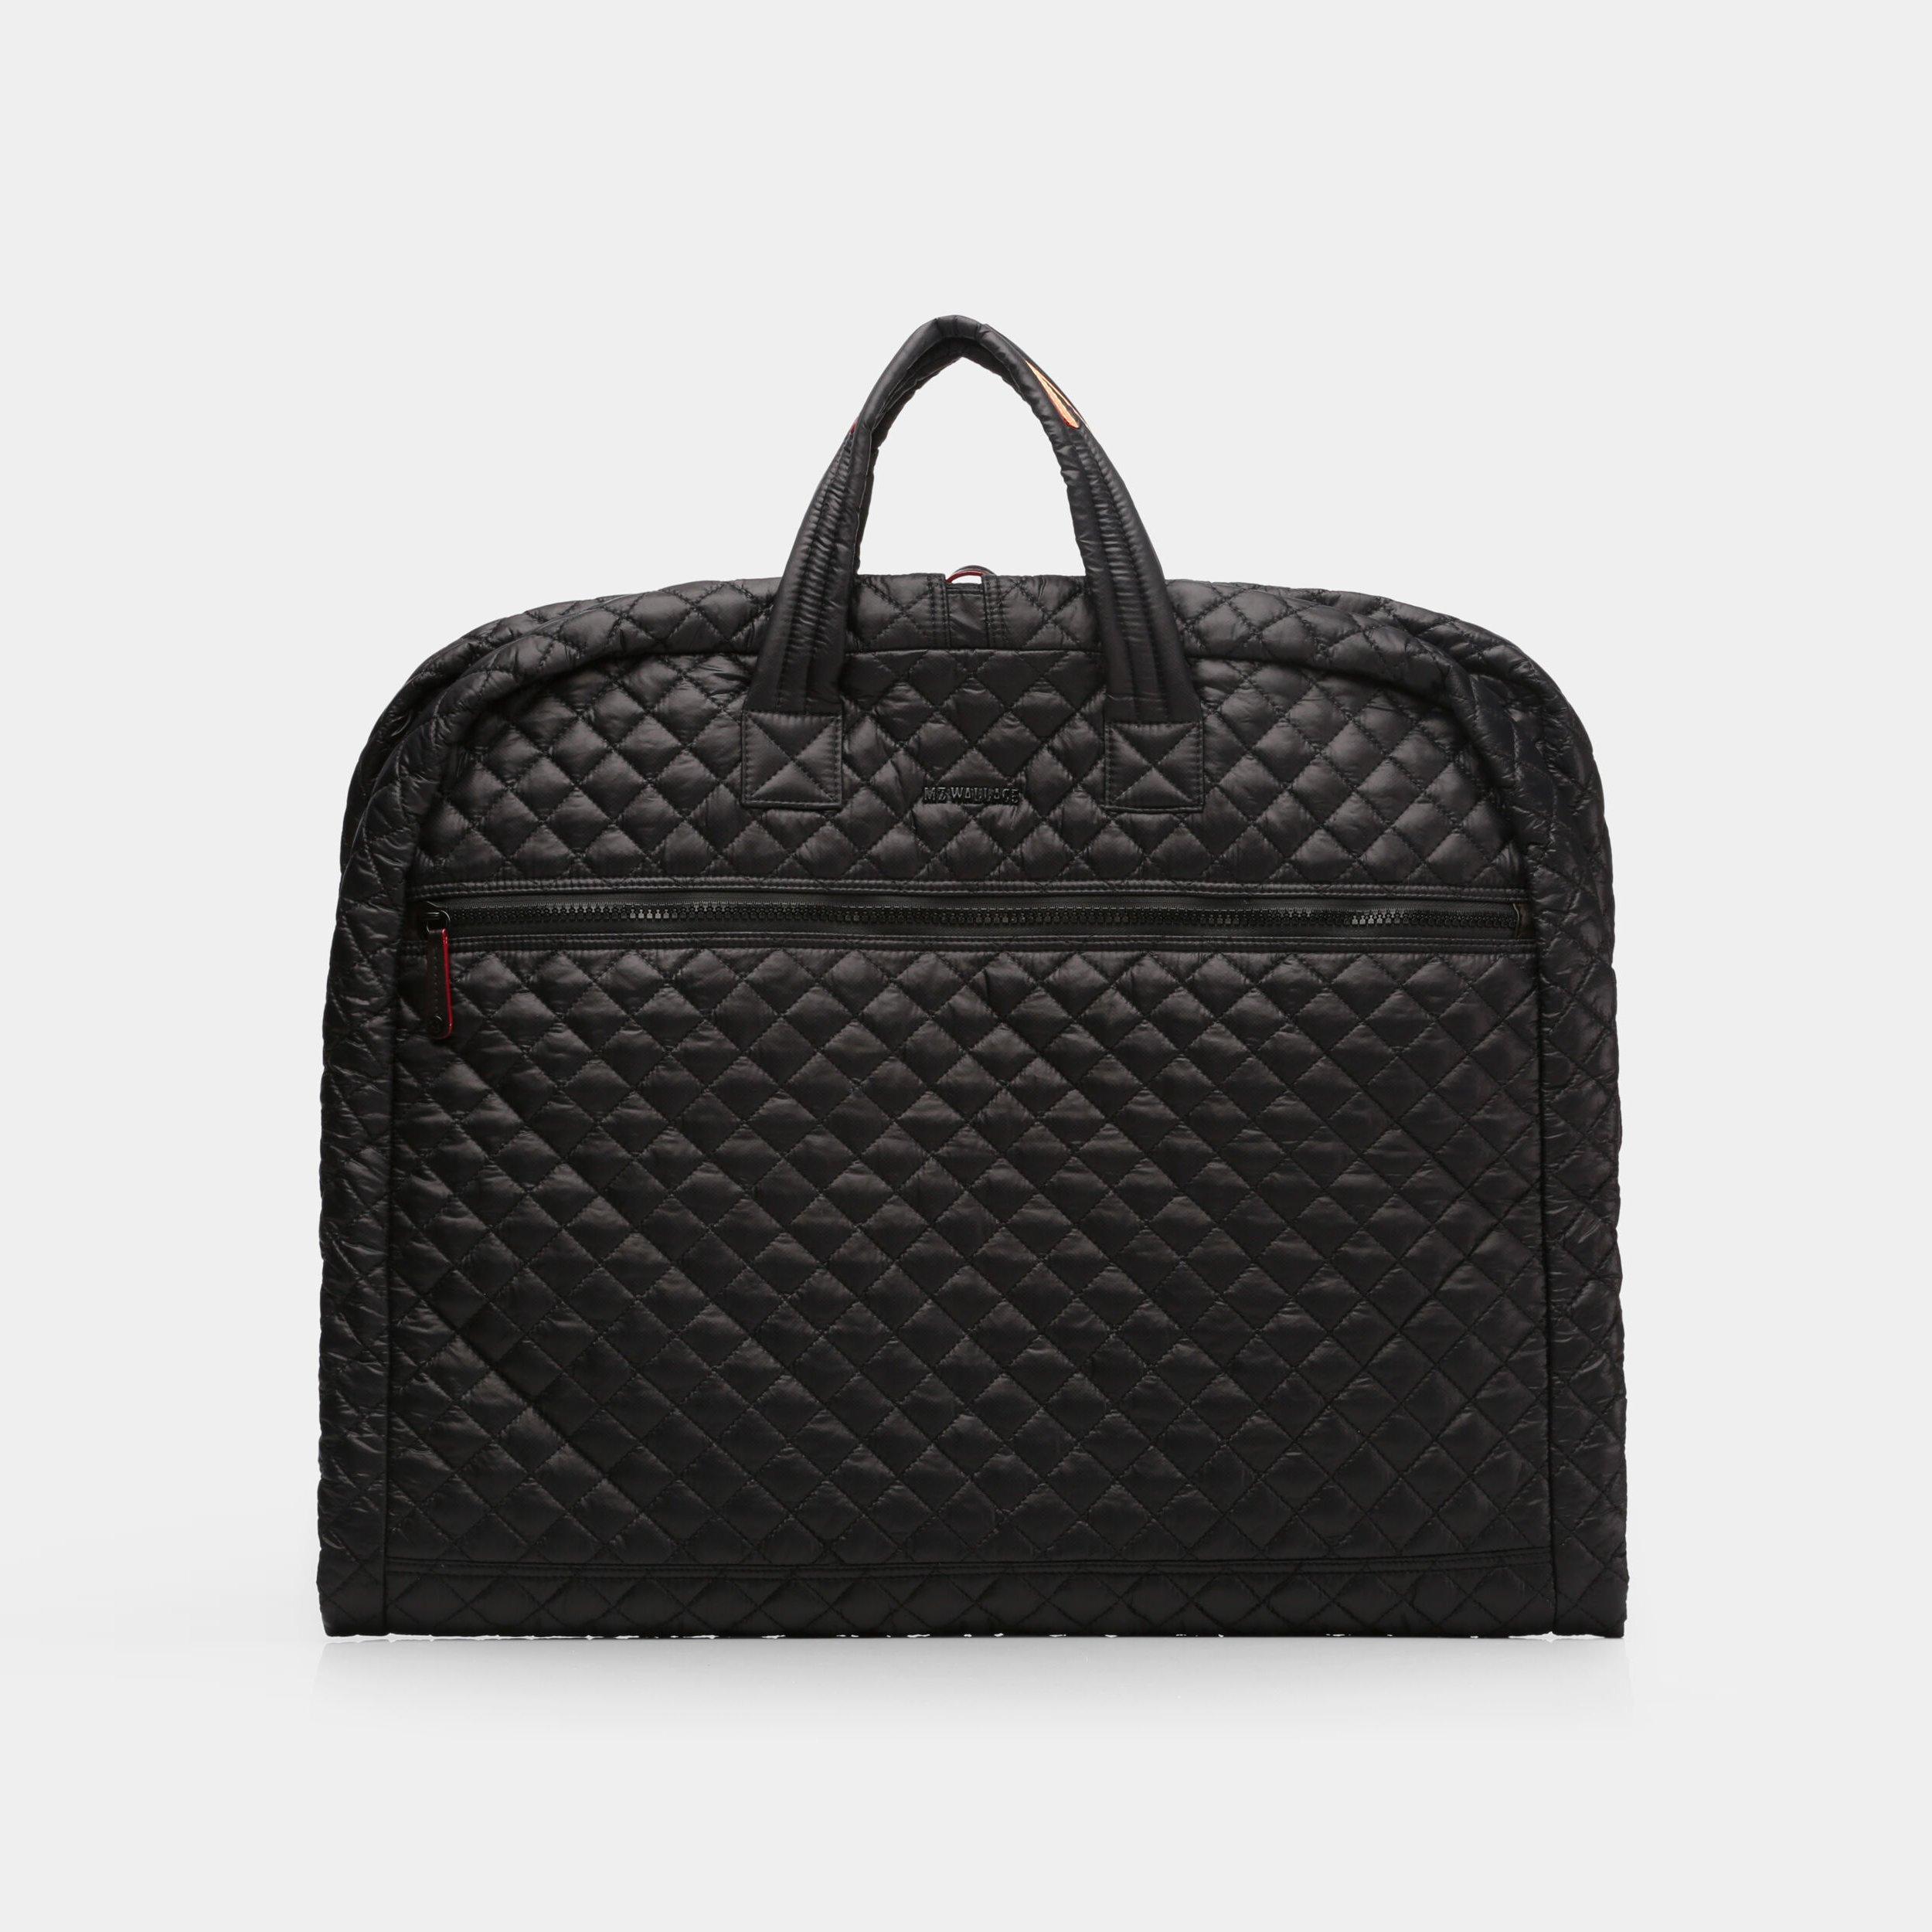 MZ Wallace Michael Garment Bag in Black